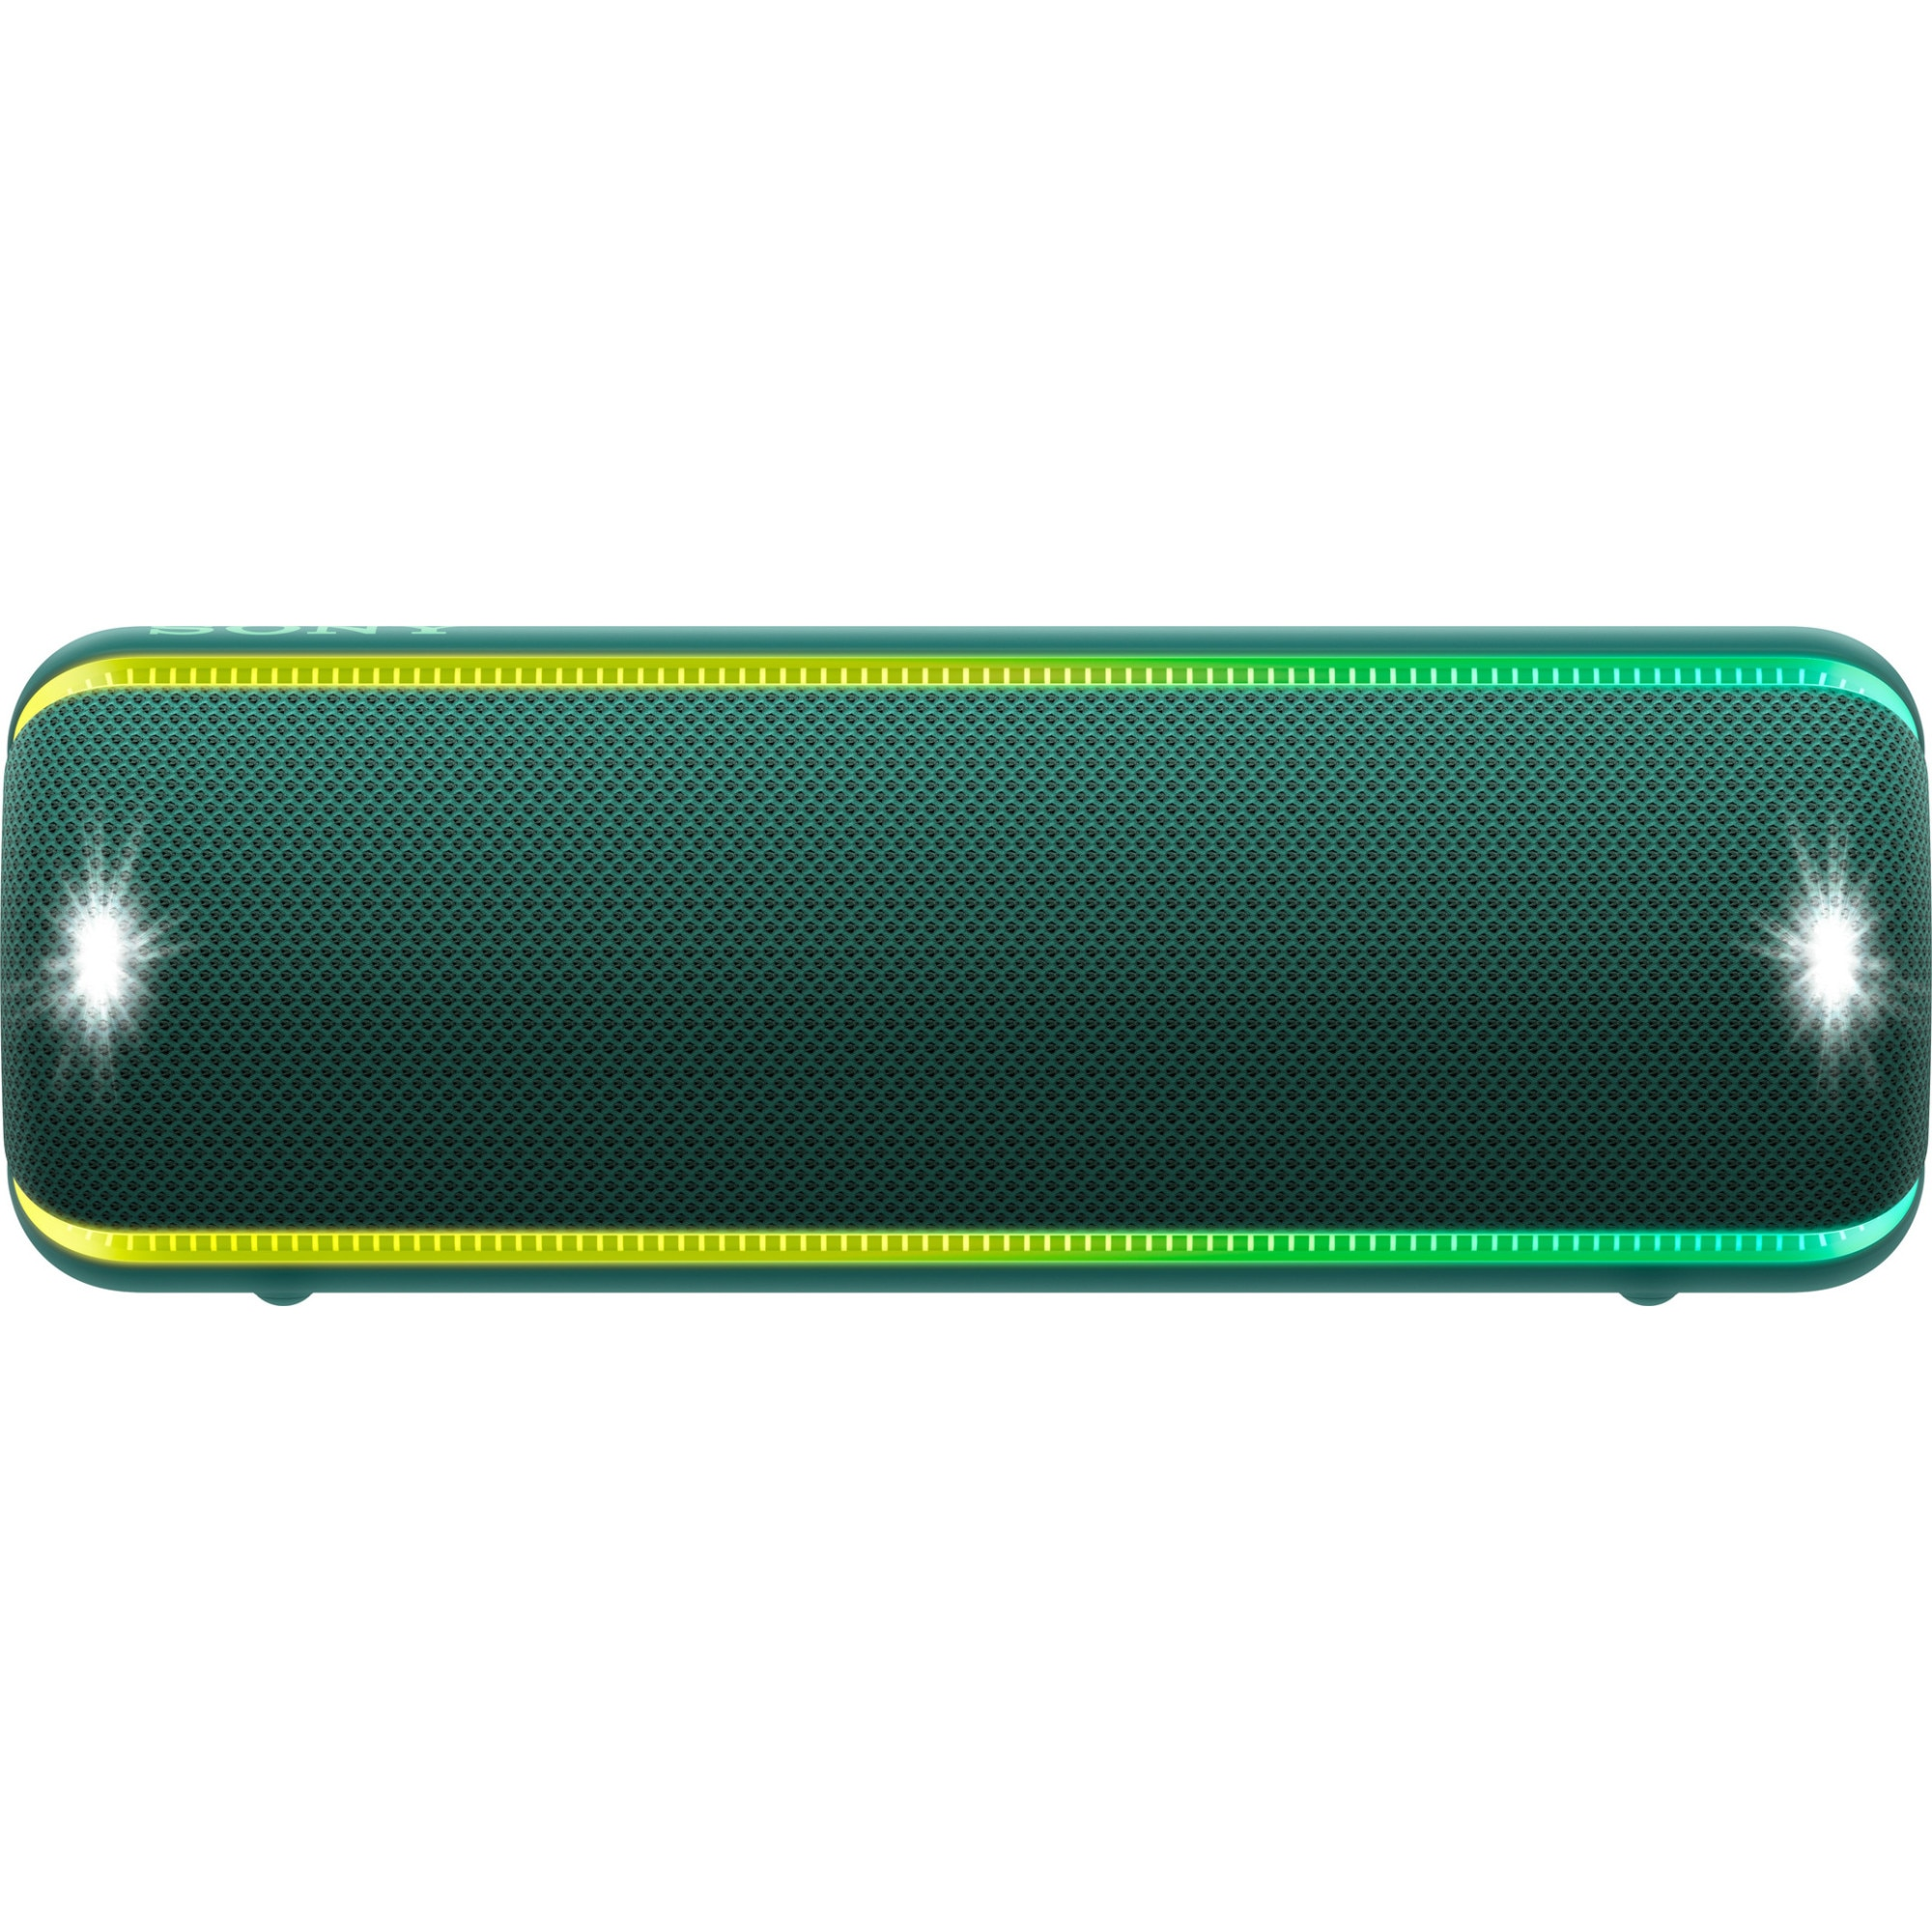 Fotografie Boxa portabila Sony SRS-XB32G, Extra Bass, LIVE SOUND, Fiestable, Wireless Party Chain, Party Booster, Efect de lumini, Rezistenta la apa IP67, Bluetooth 4.2, NFC, Autonomie 24 ore, USB cu functie de incarcare, Verde